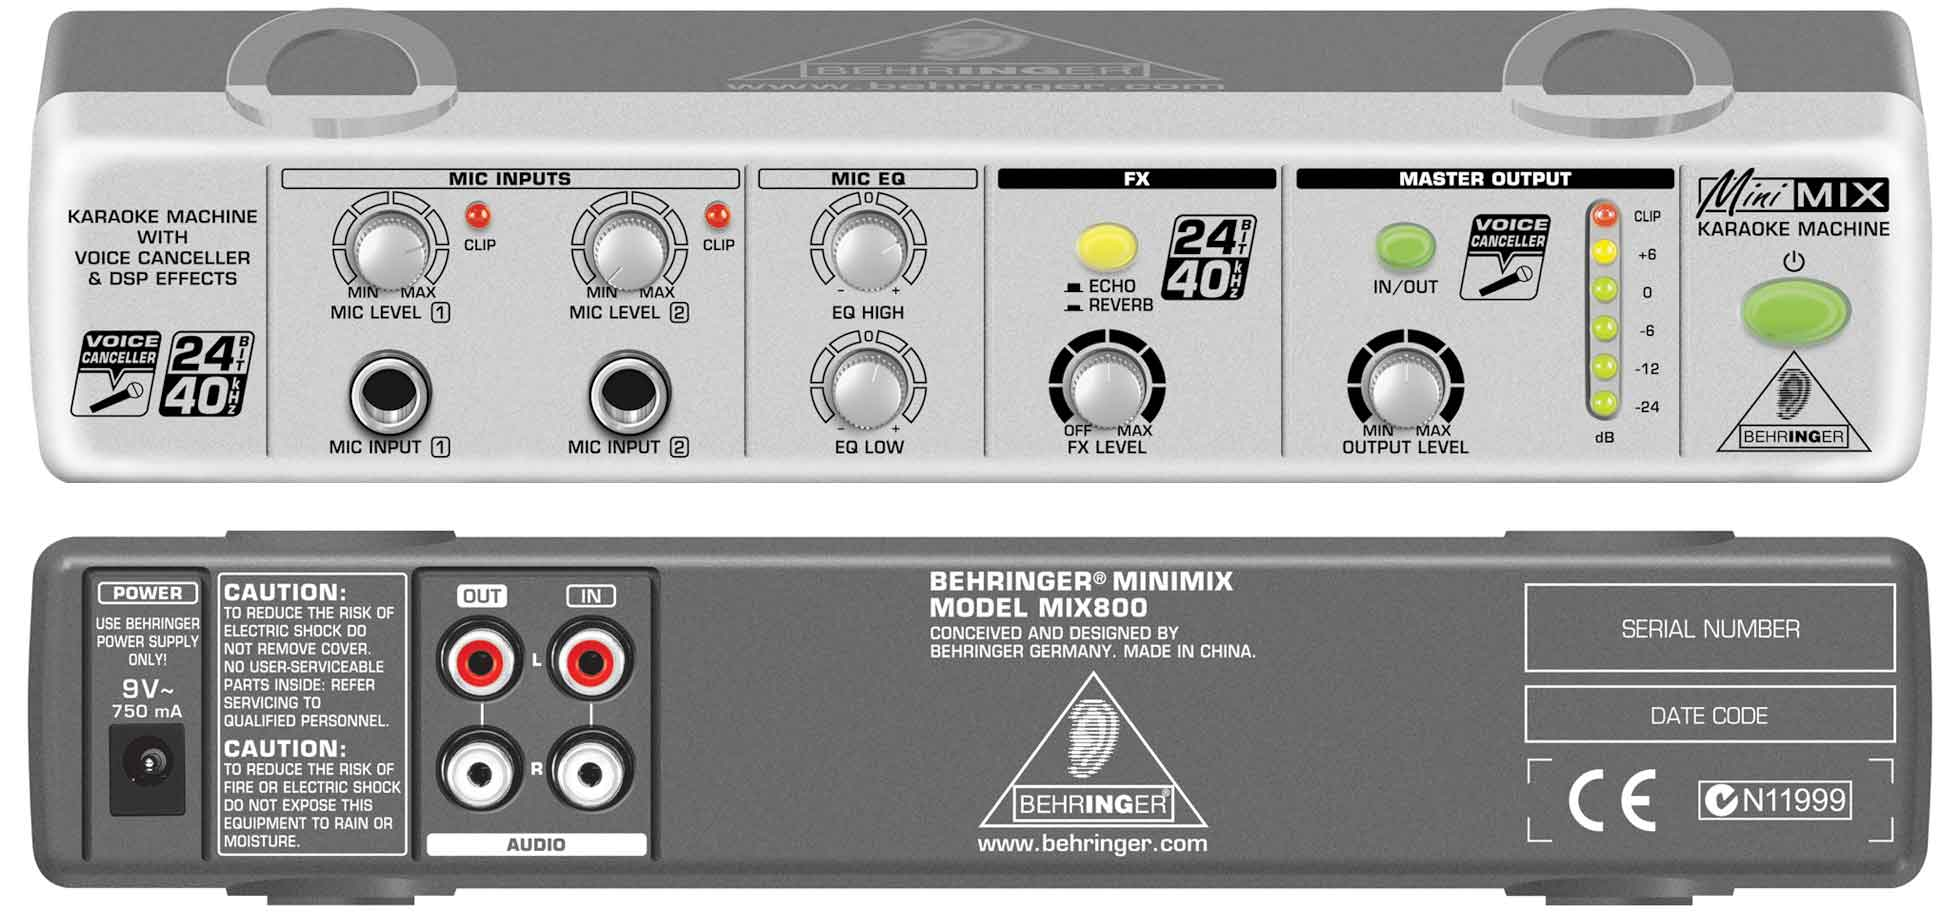 Thiết bị hát karaoke online Behringer MIX800